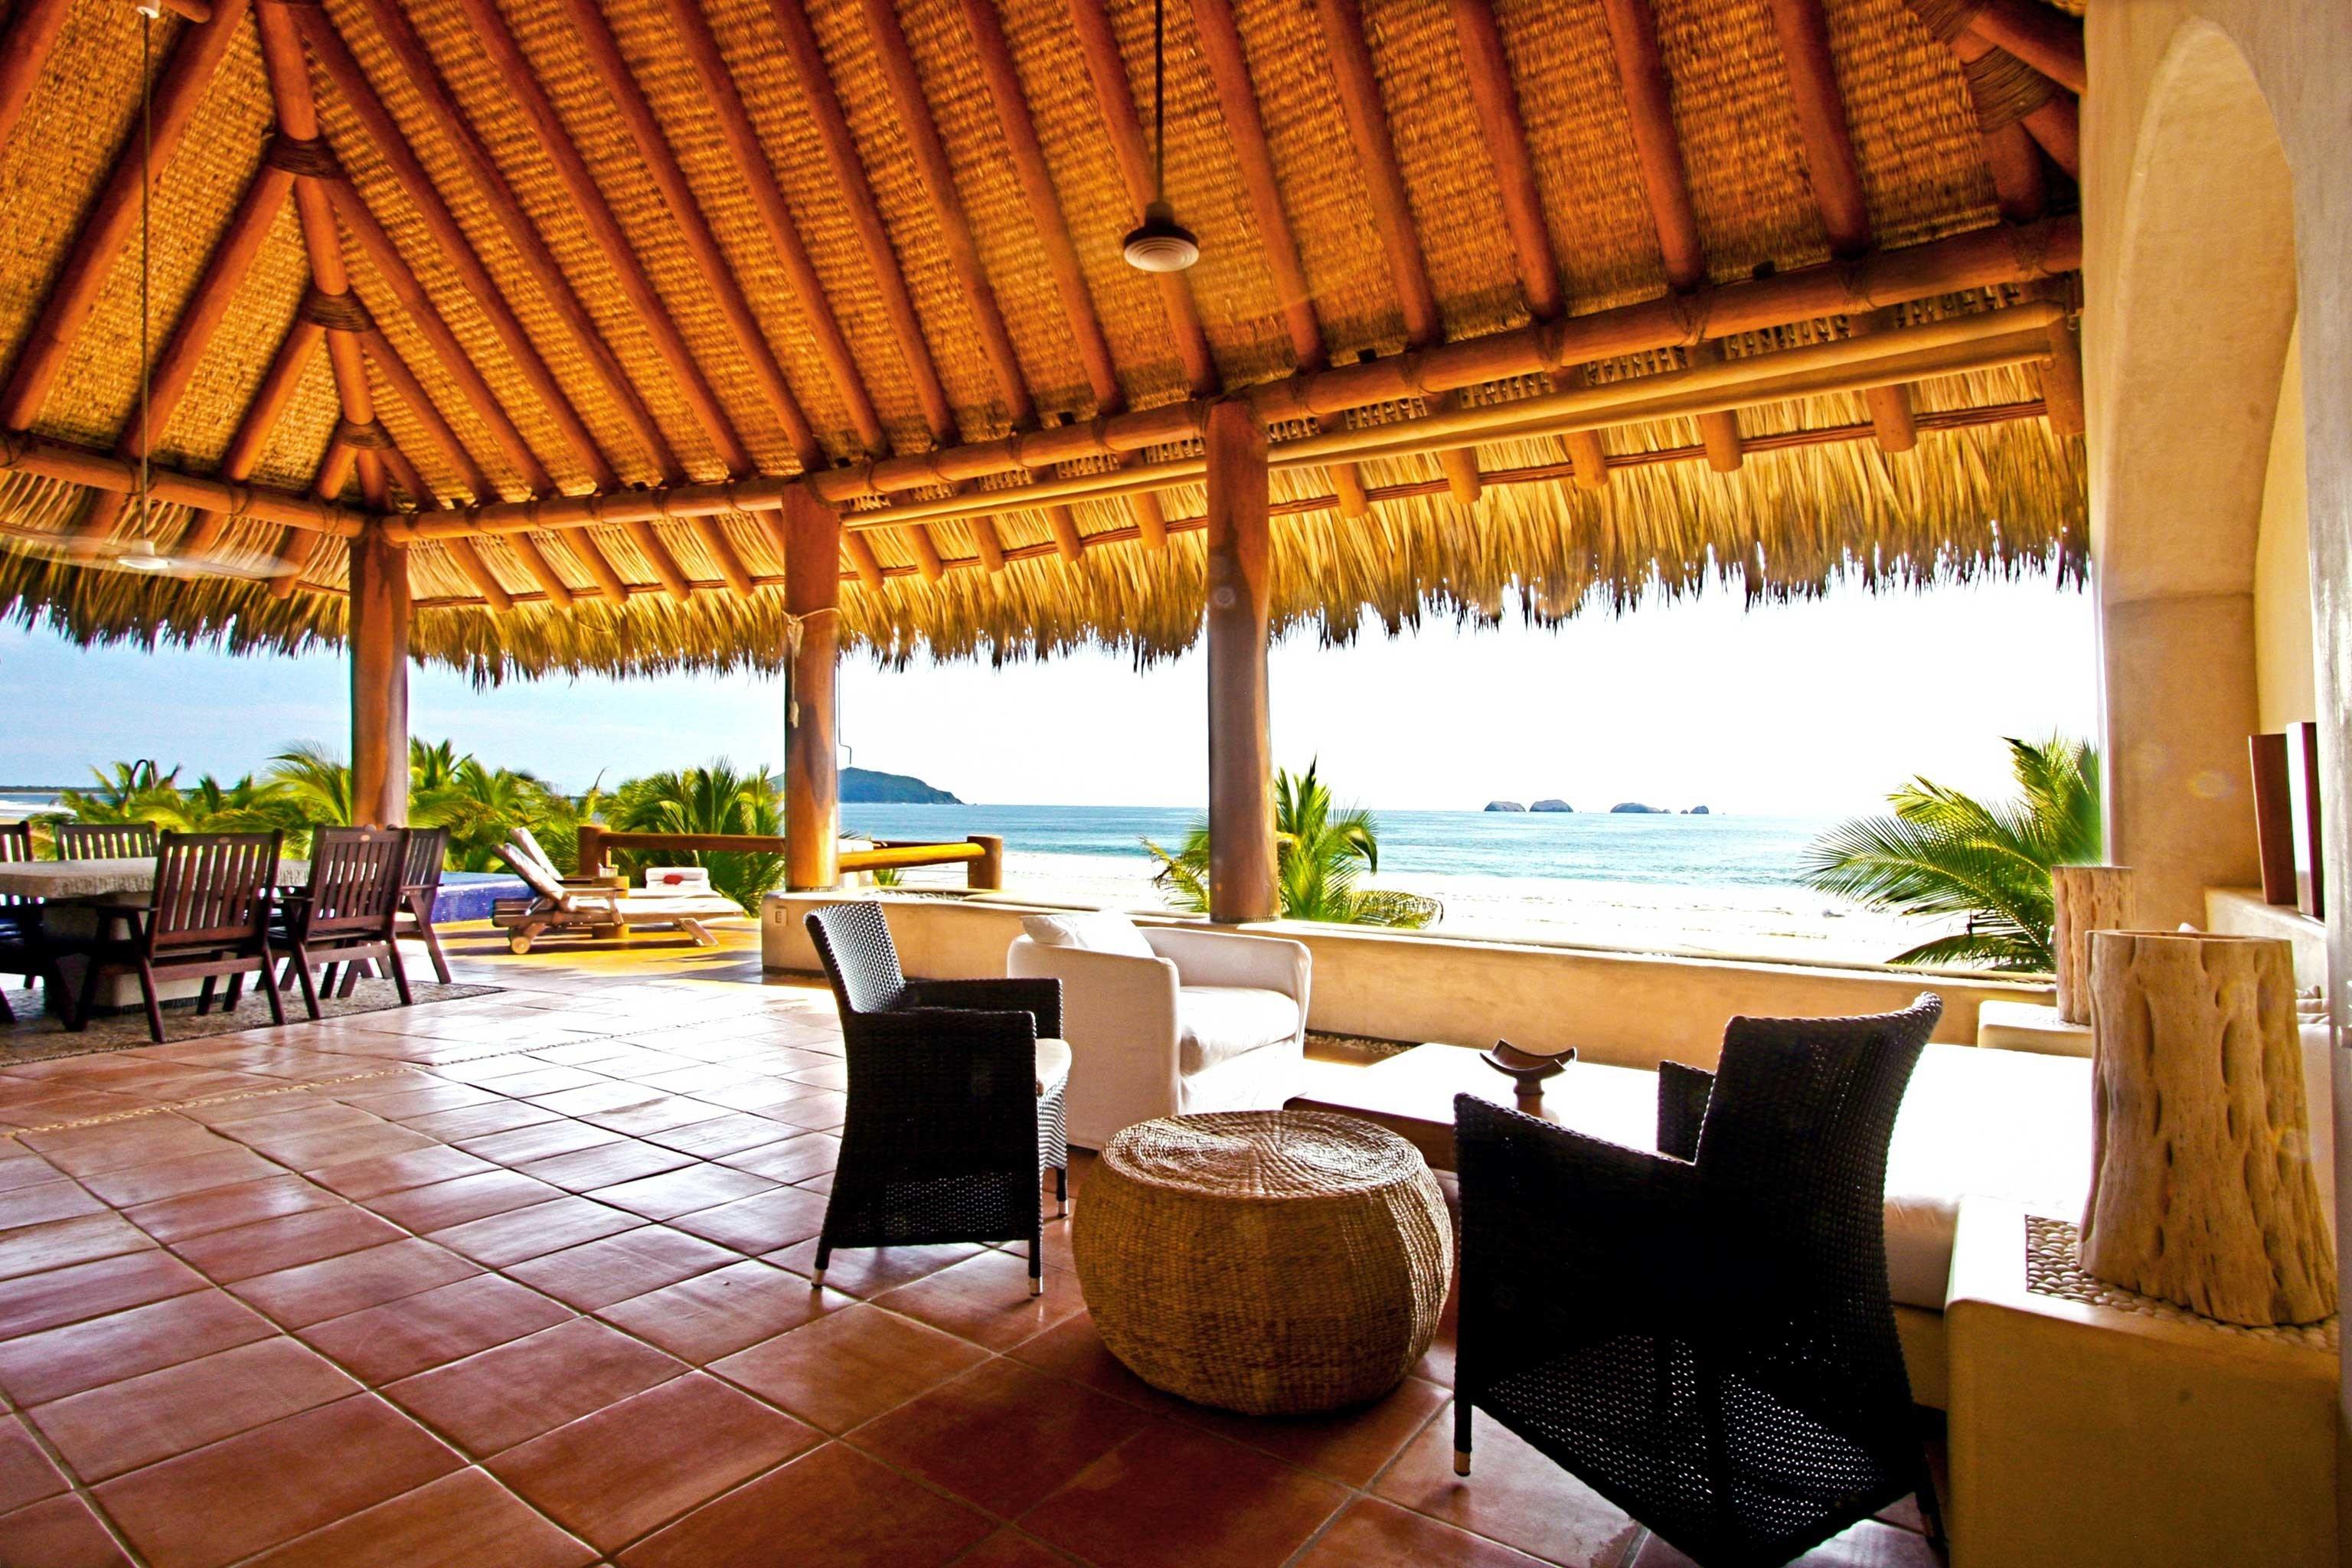 Beach Beachfront Deck Scenic views chair Resort property Villa hacienda eco hotel restaurant